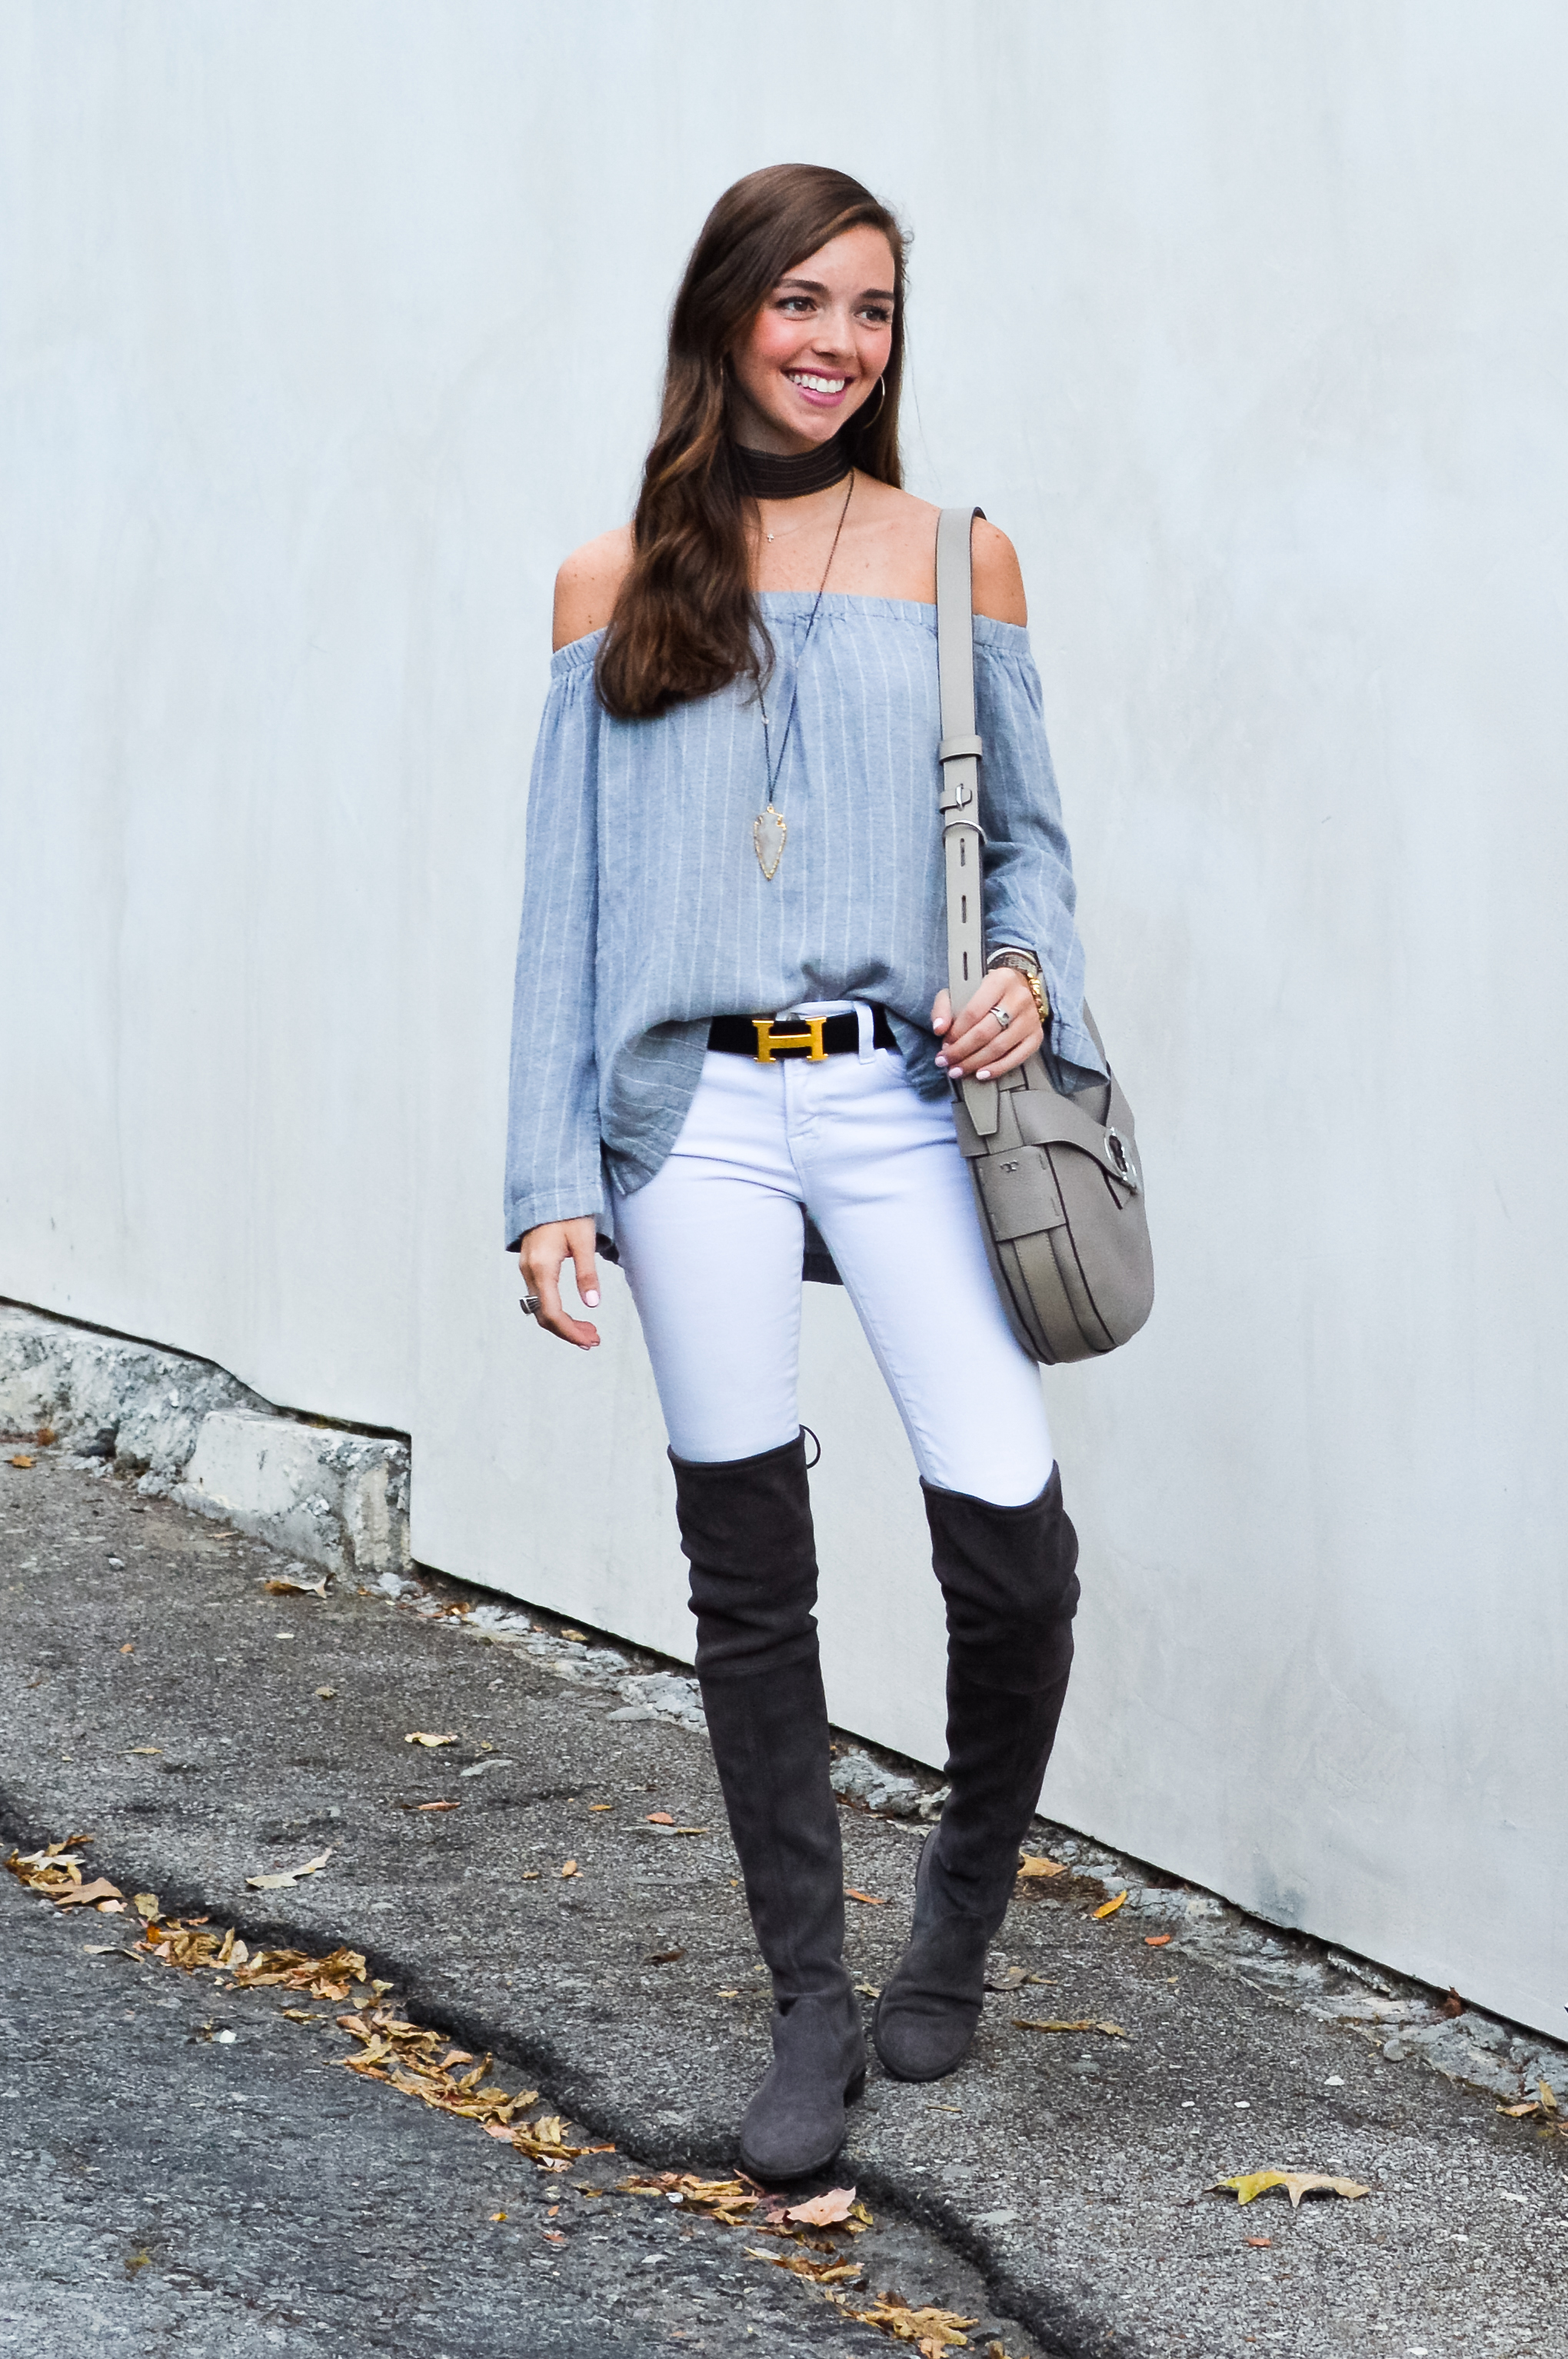 fashion blogger lcb style stuart weitzman tory burch over the knee fall fashion (26 of 29).jpg